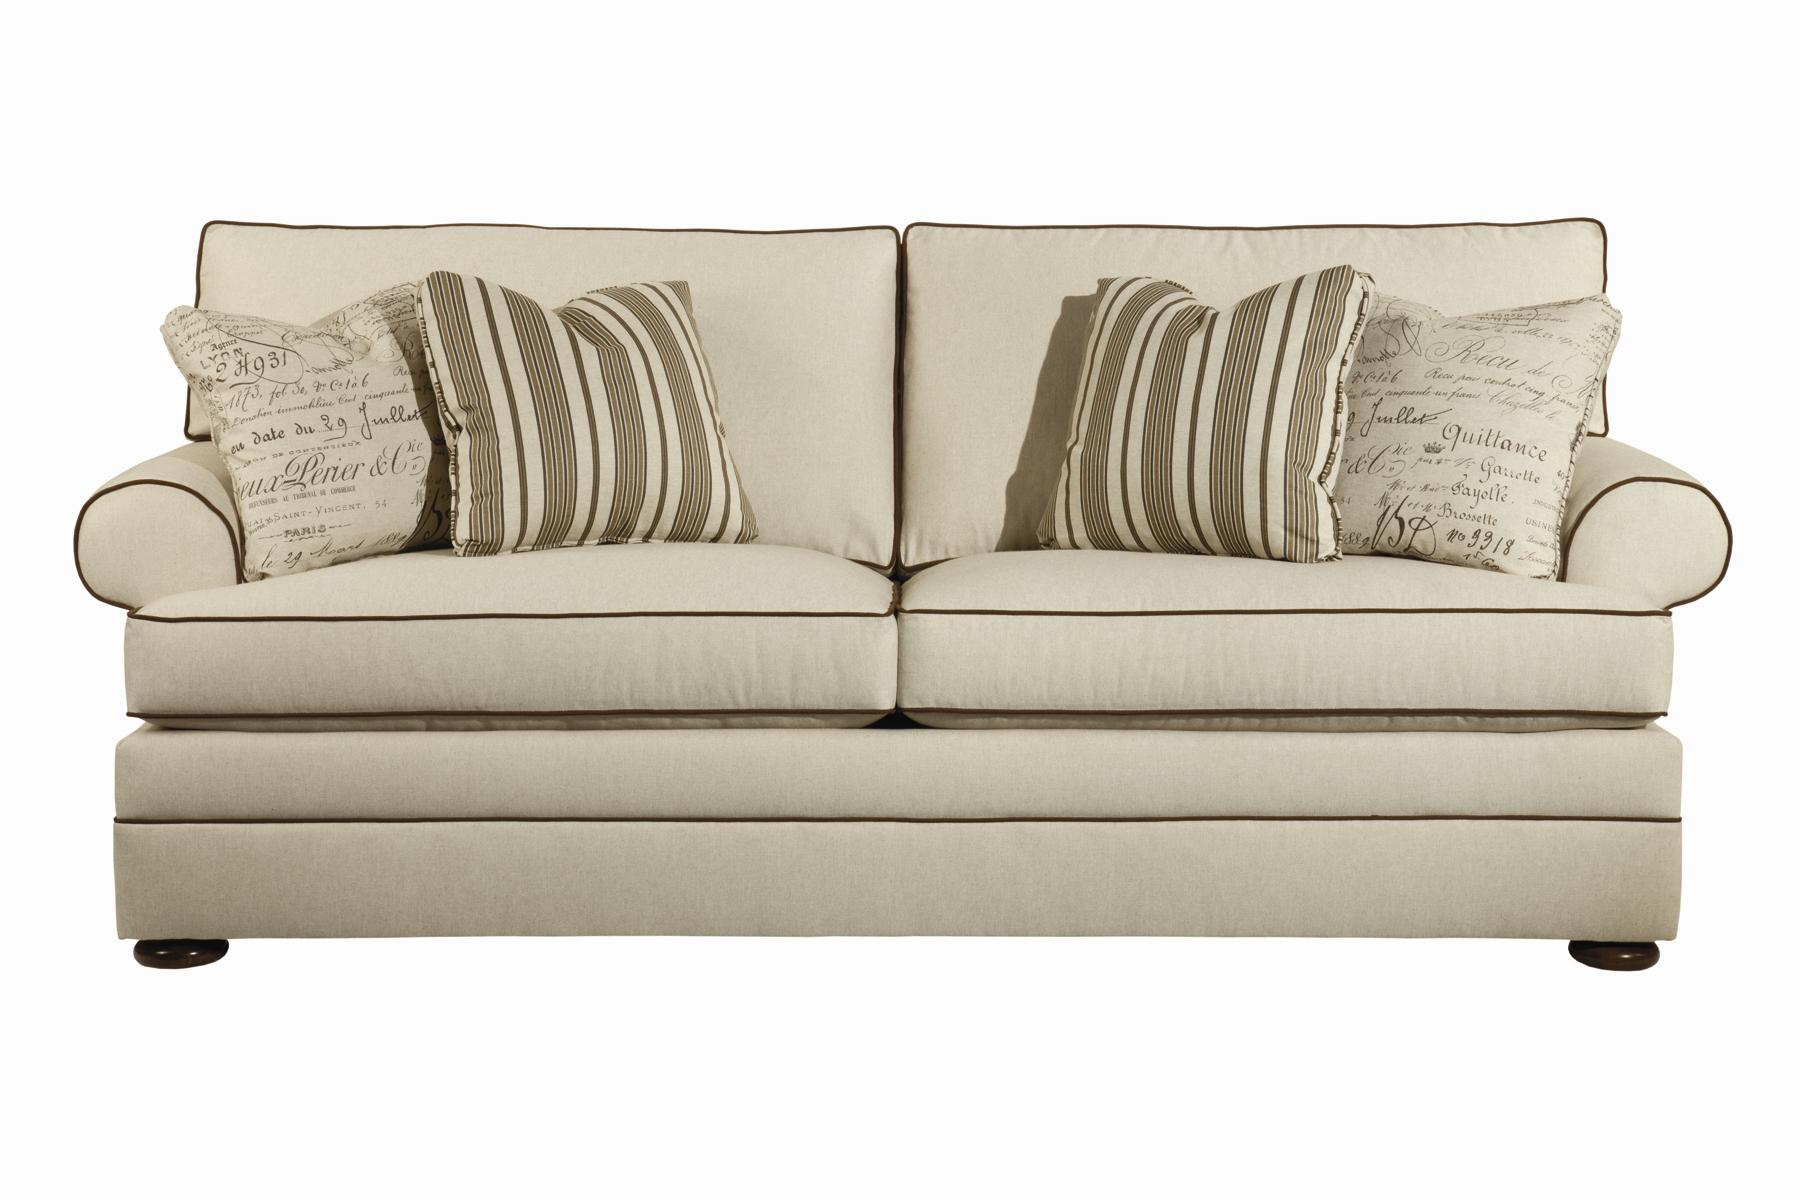 Custom 2-Seat Sofa